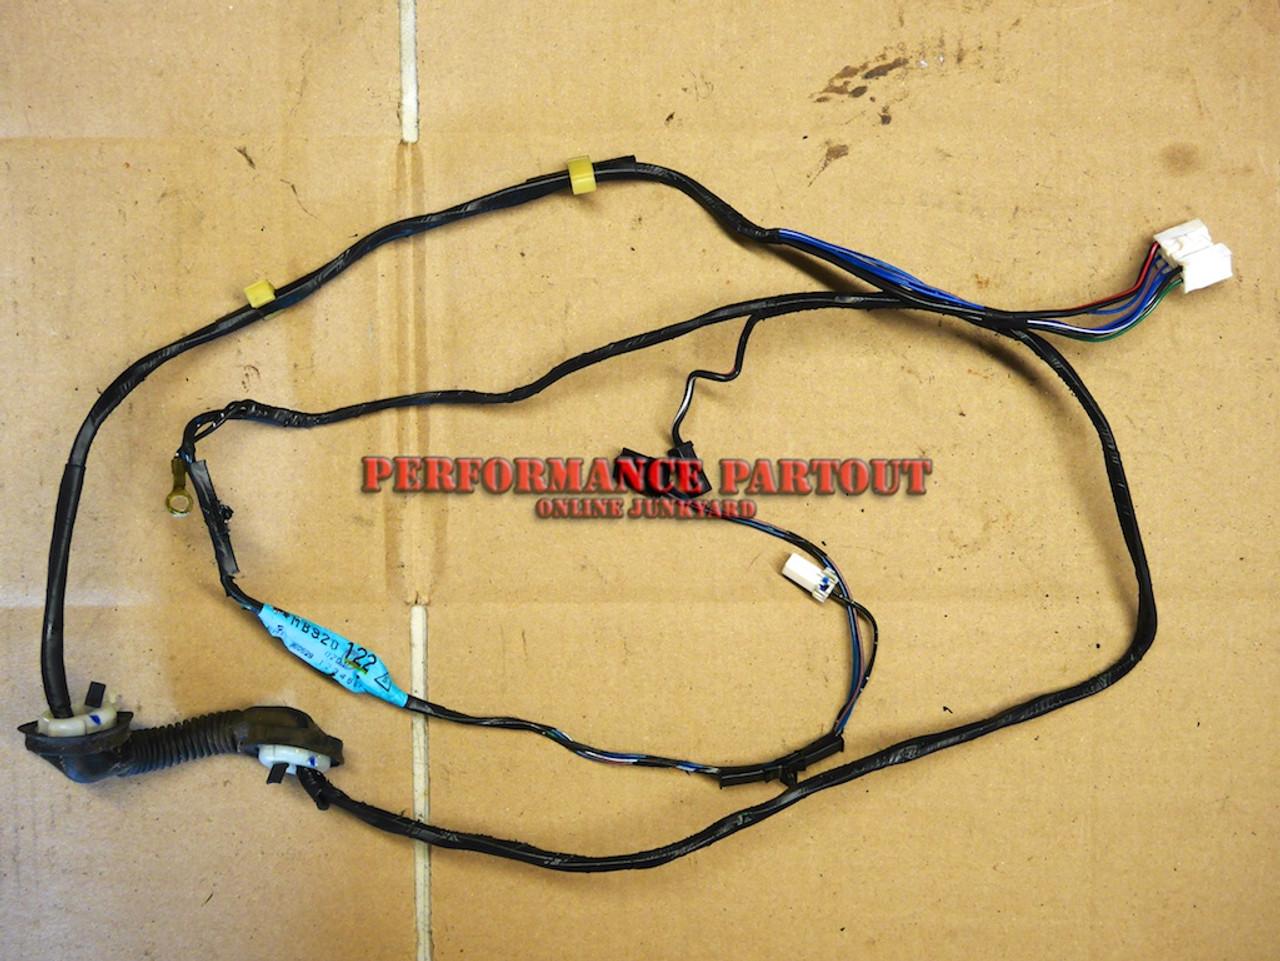 medium resolution of hatch wiring harness 2g dsm performance partout 2008 subaru outback hatch wiring harness hatch wiring harness